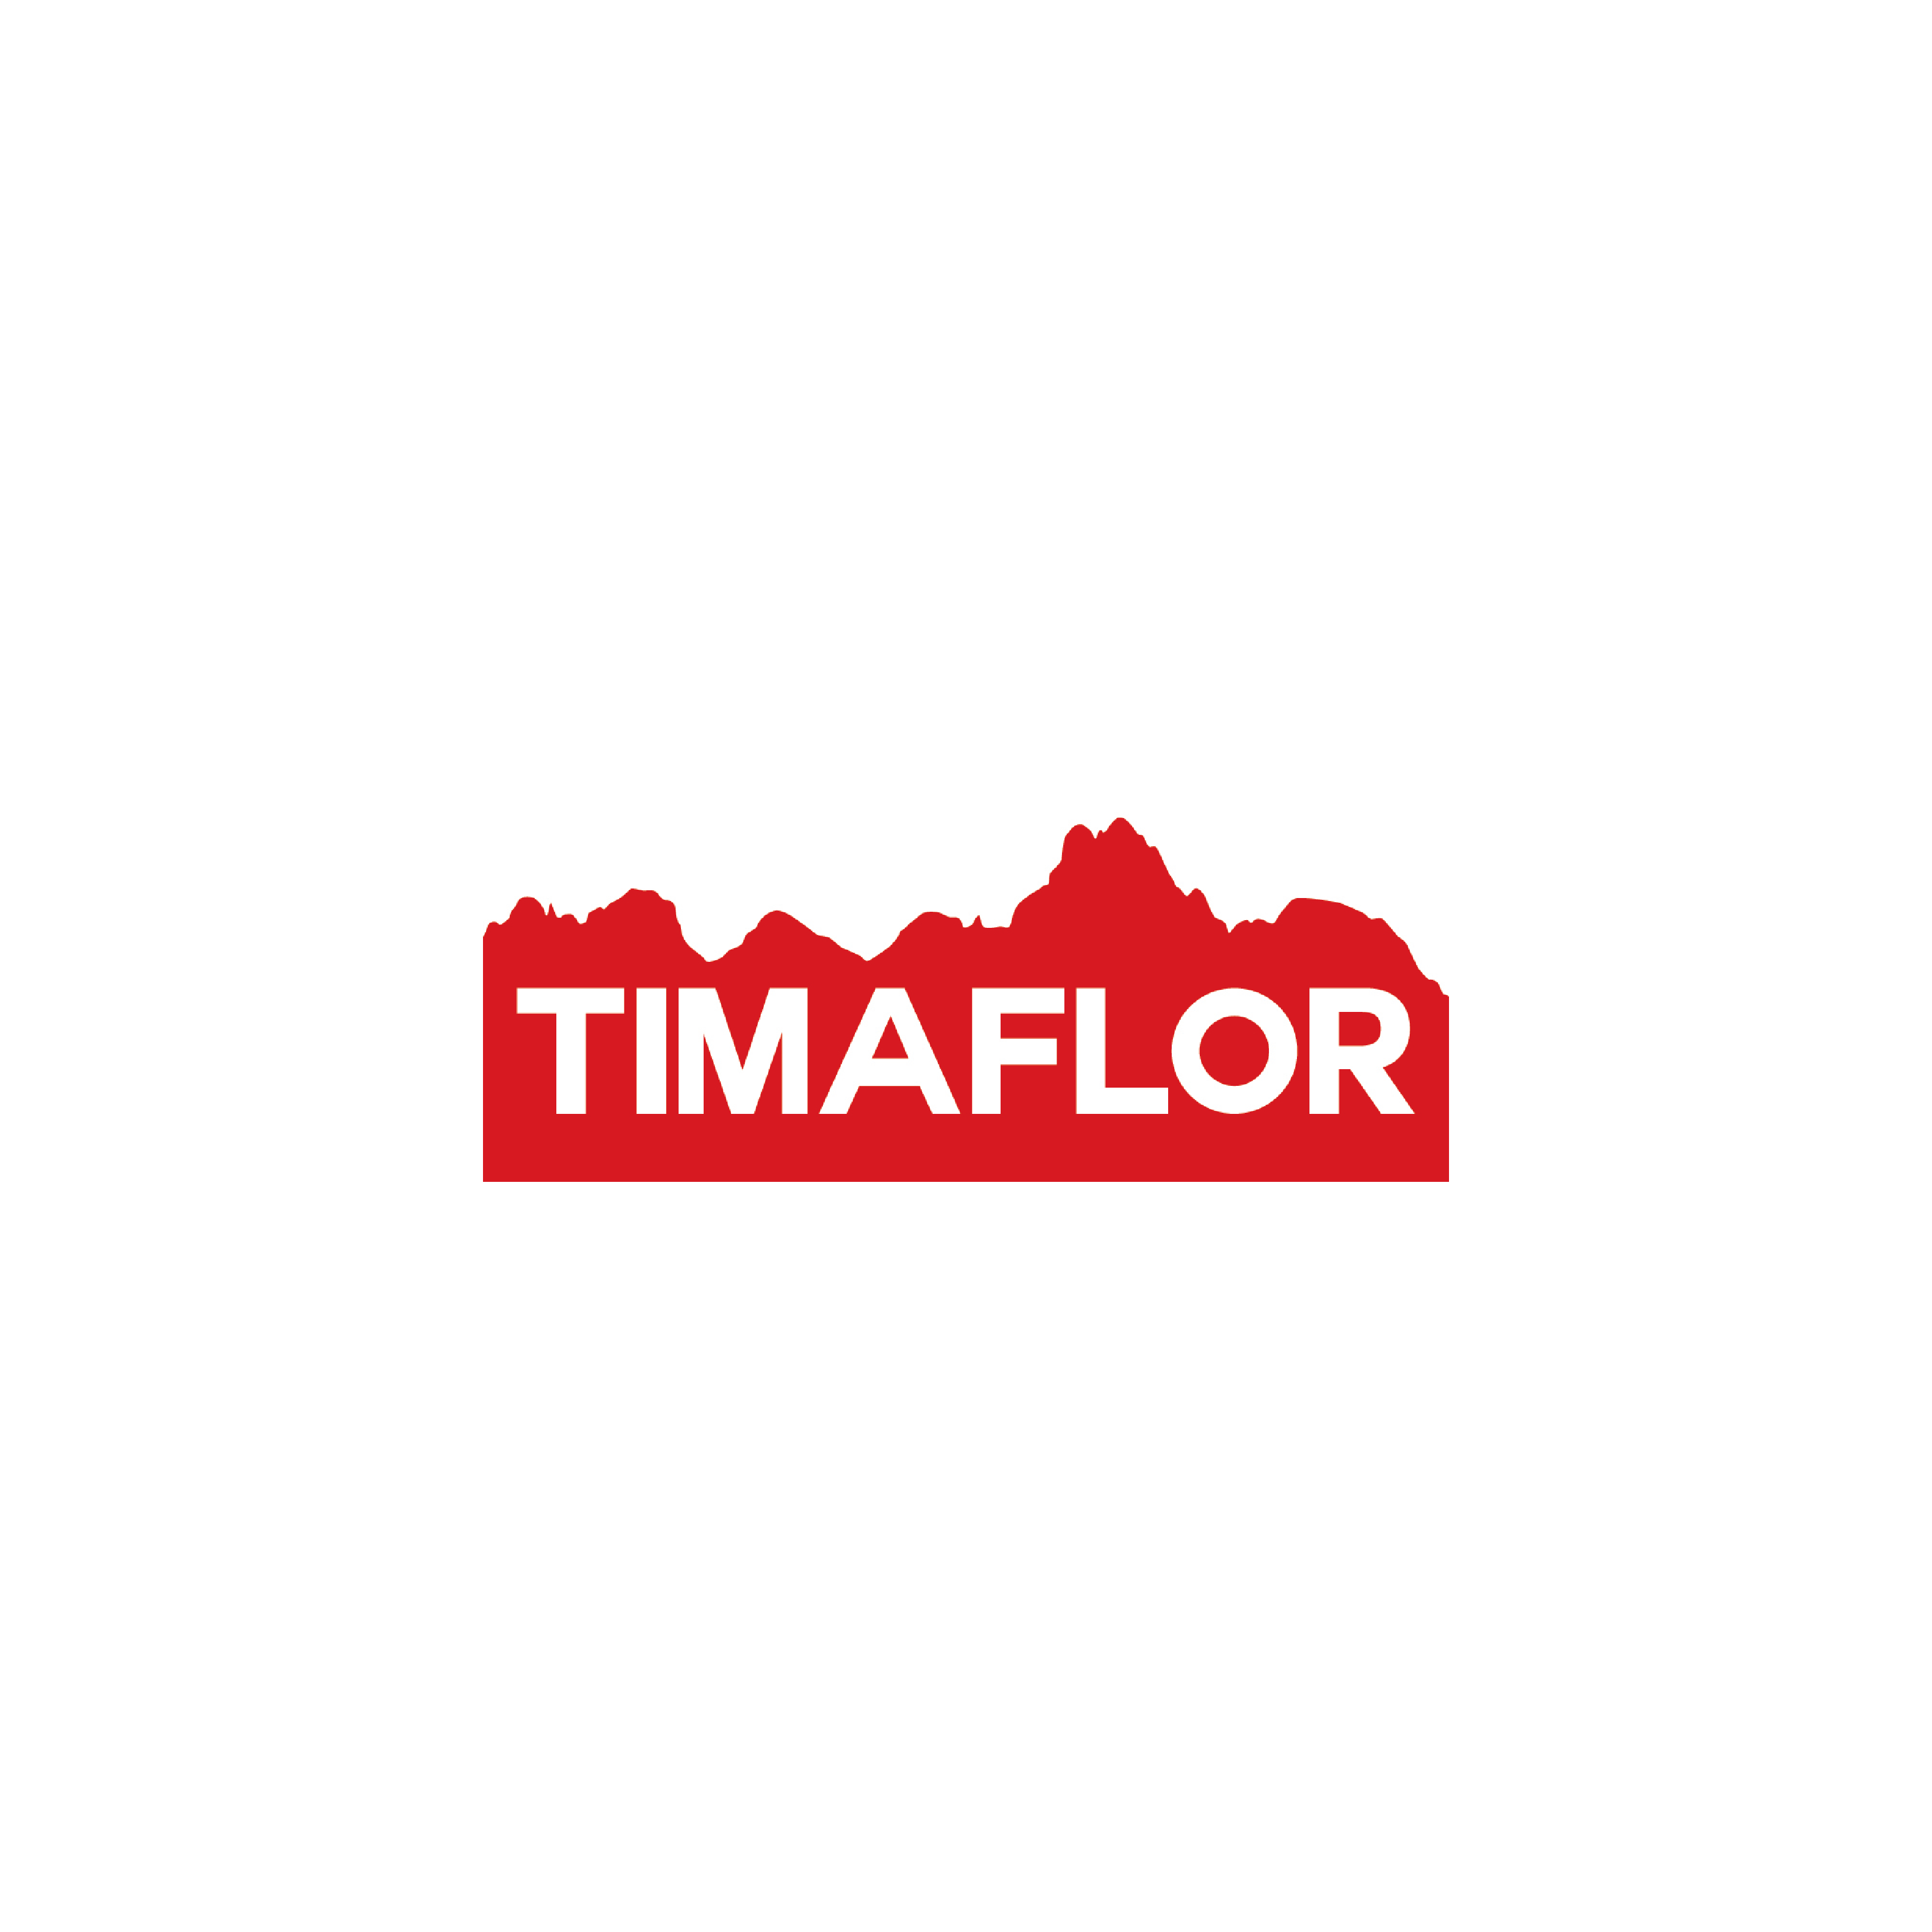 Timaflor Ltd